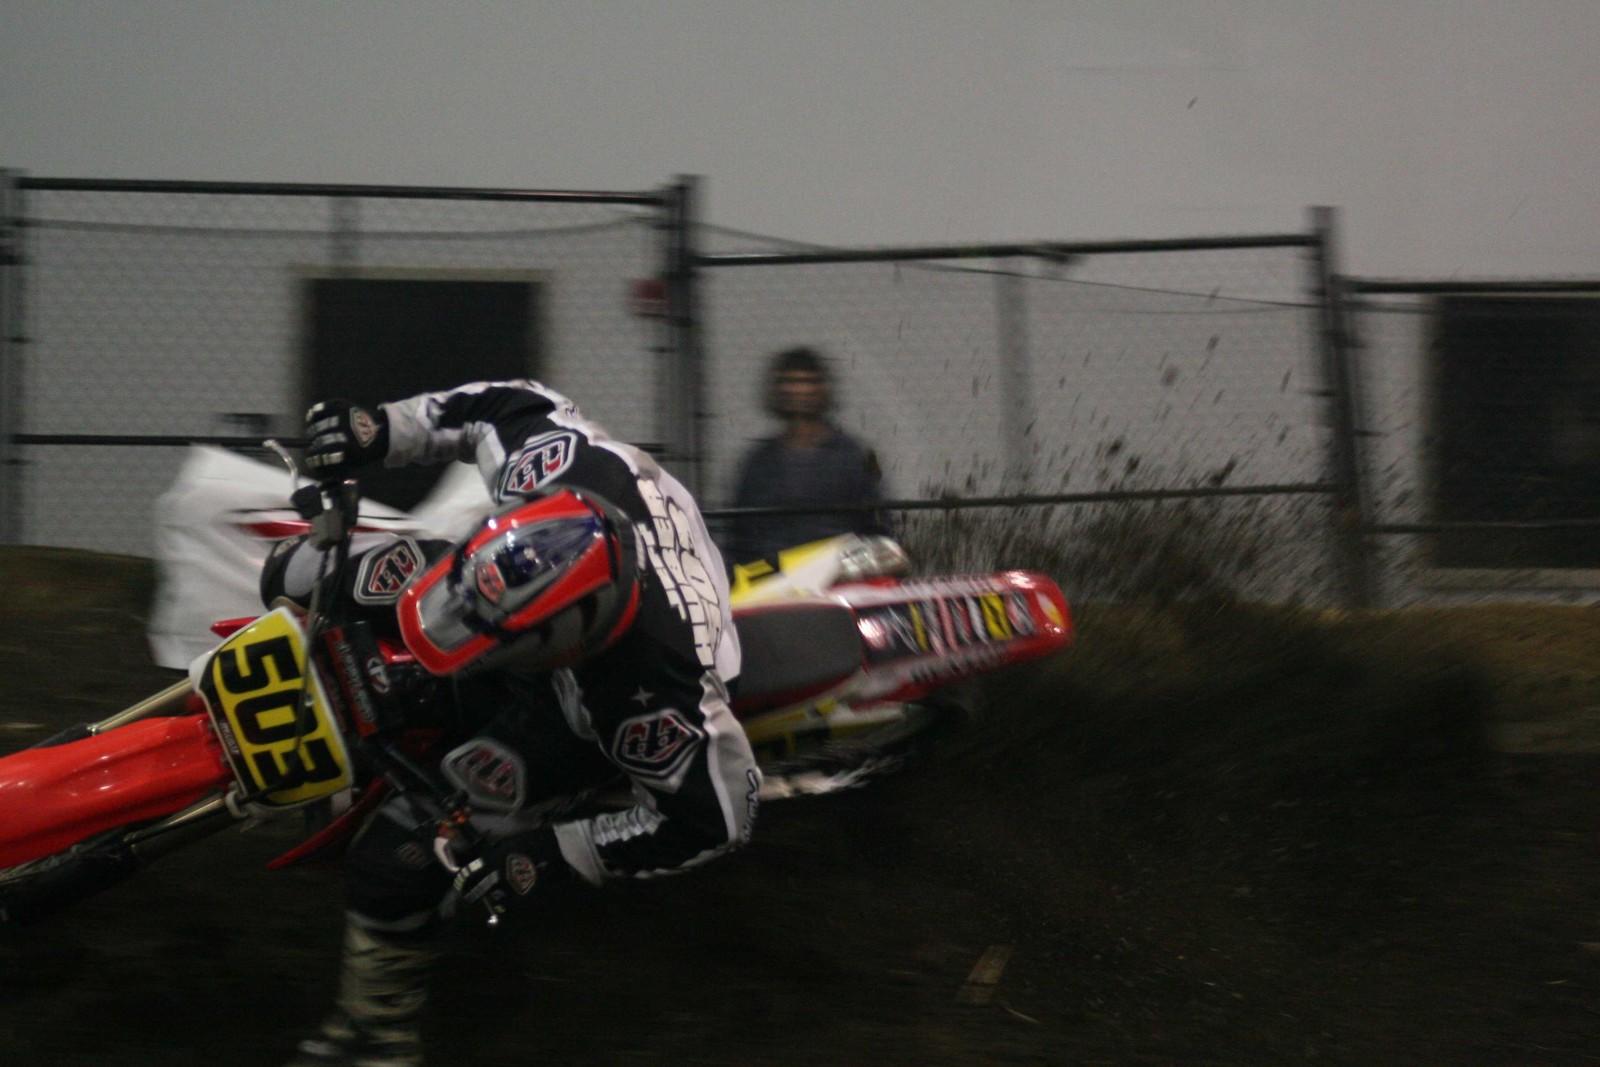 Huber503 #1 - jeffro503 - Motocross Pictures - Vital MX